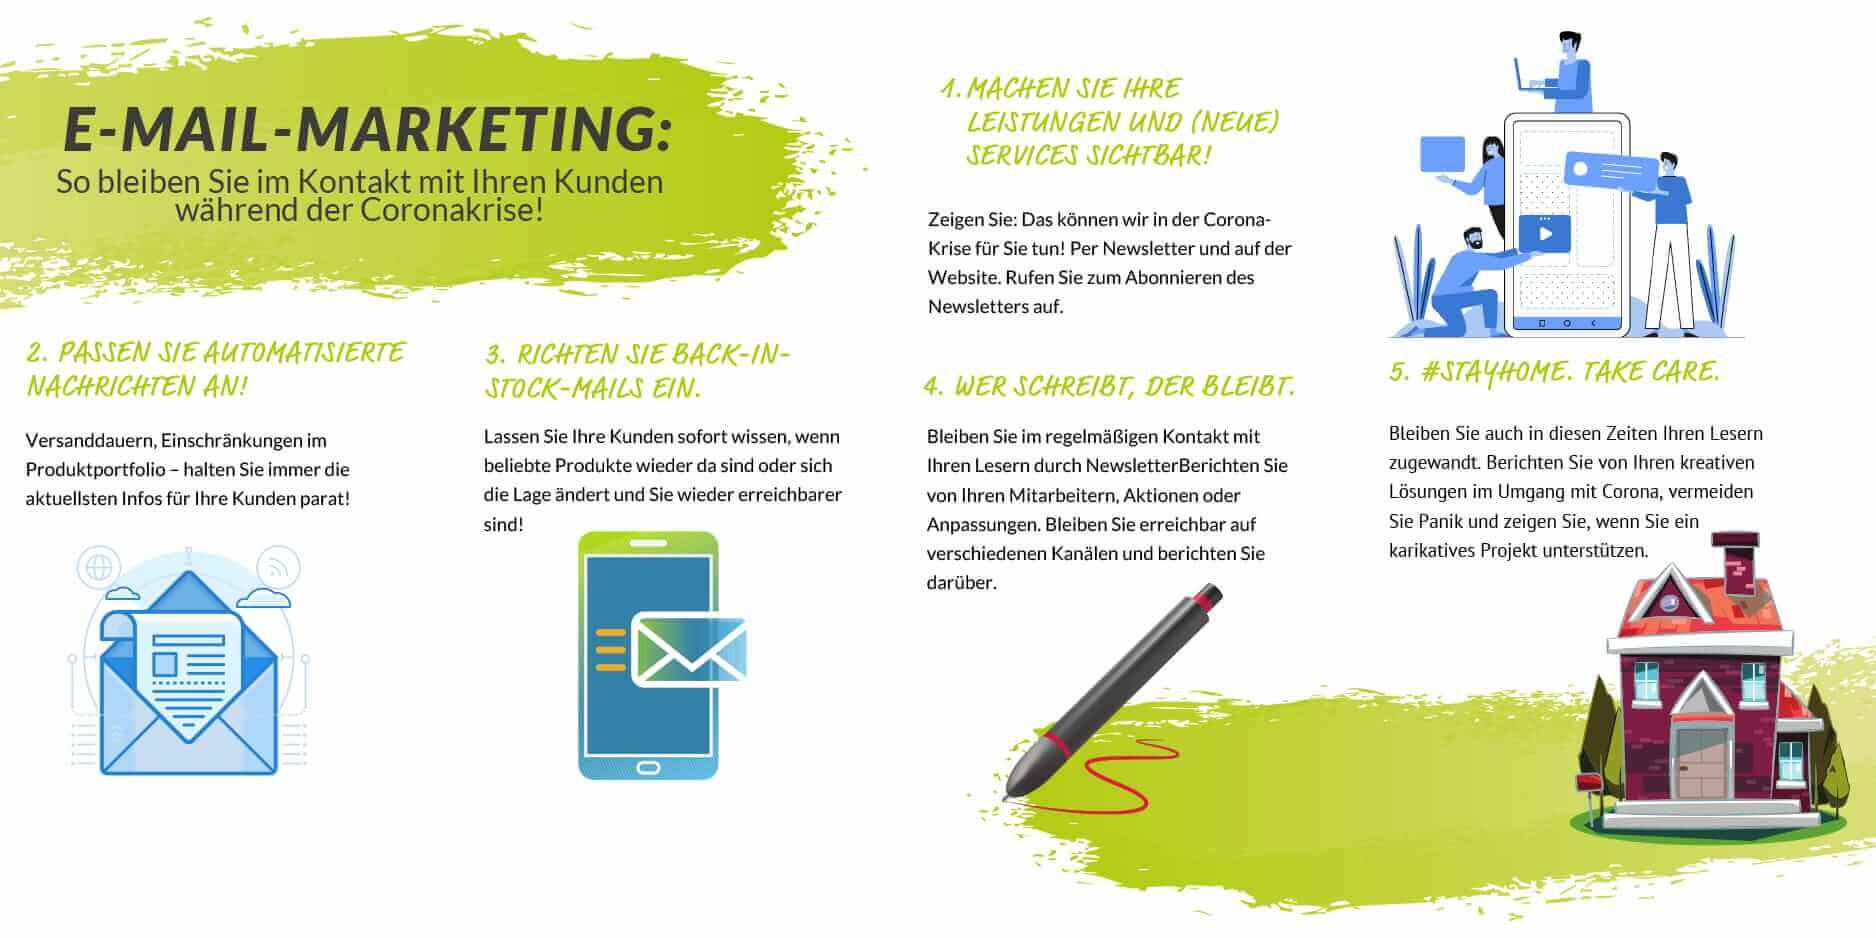 Tipps E-Mail-Marketing während Corona Infografik